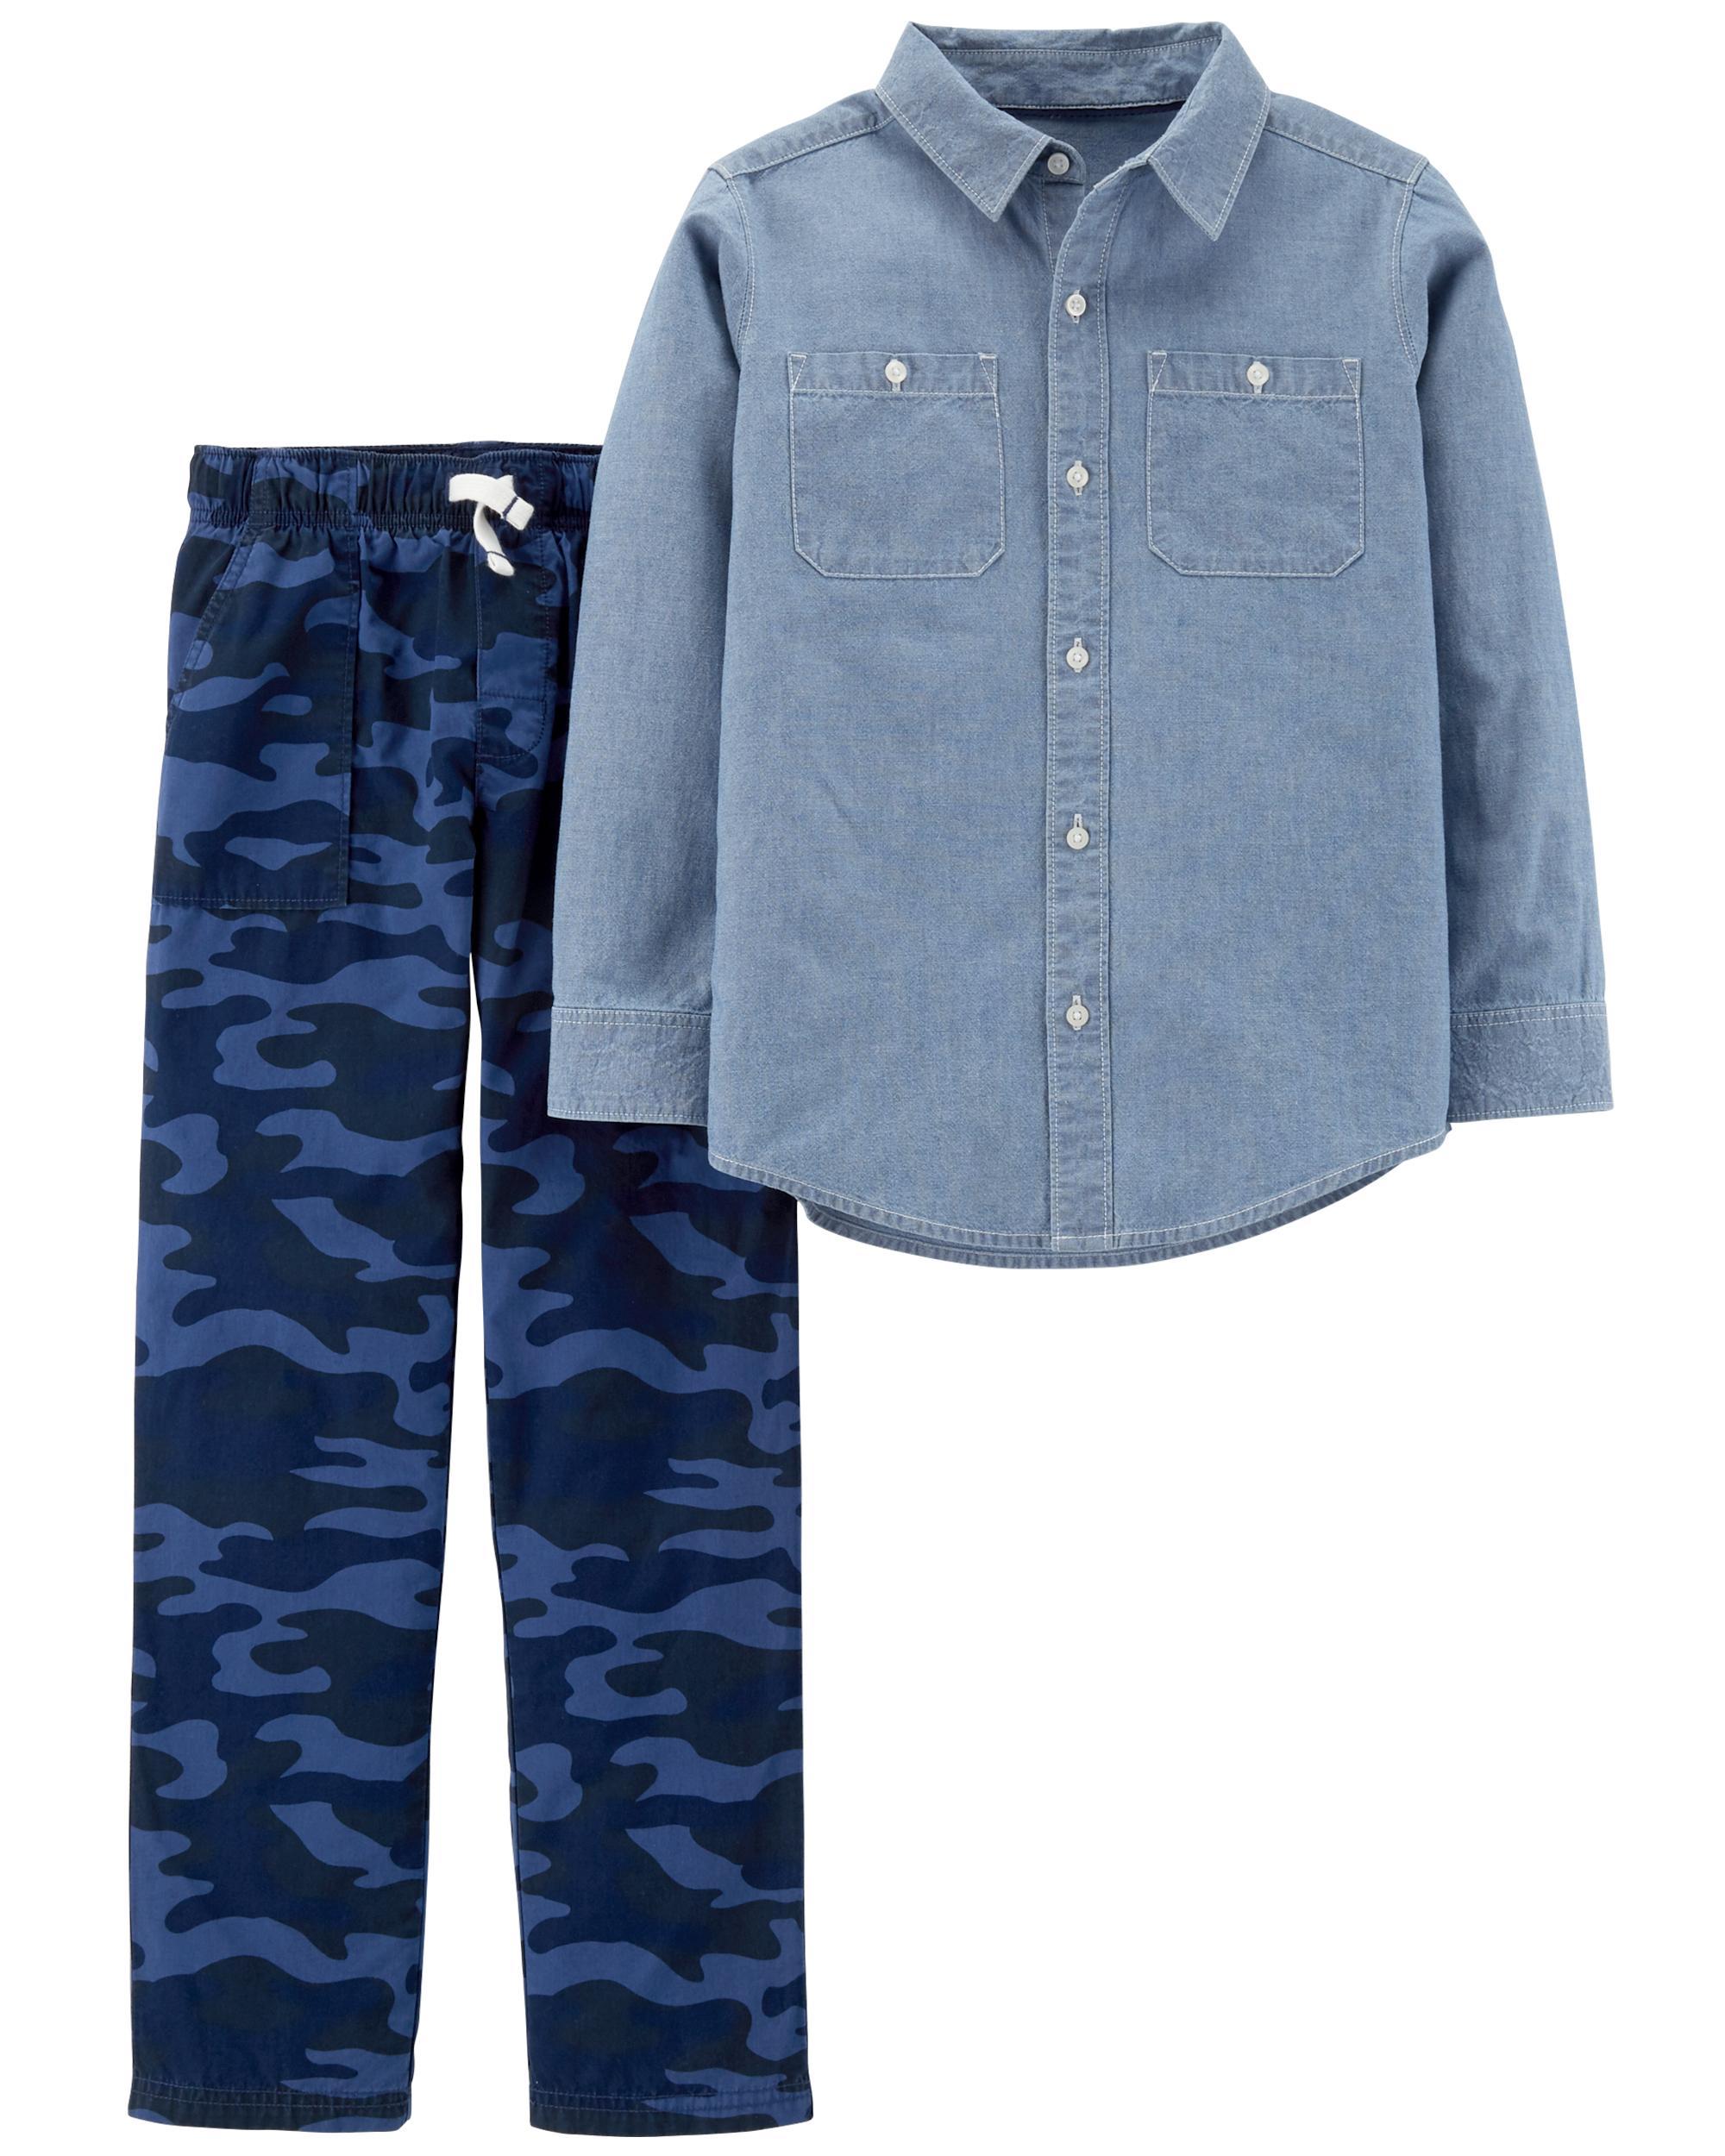 Newborn Baby Boys Handsome Camouflage Pocket Hoodie Tops Long Pants set